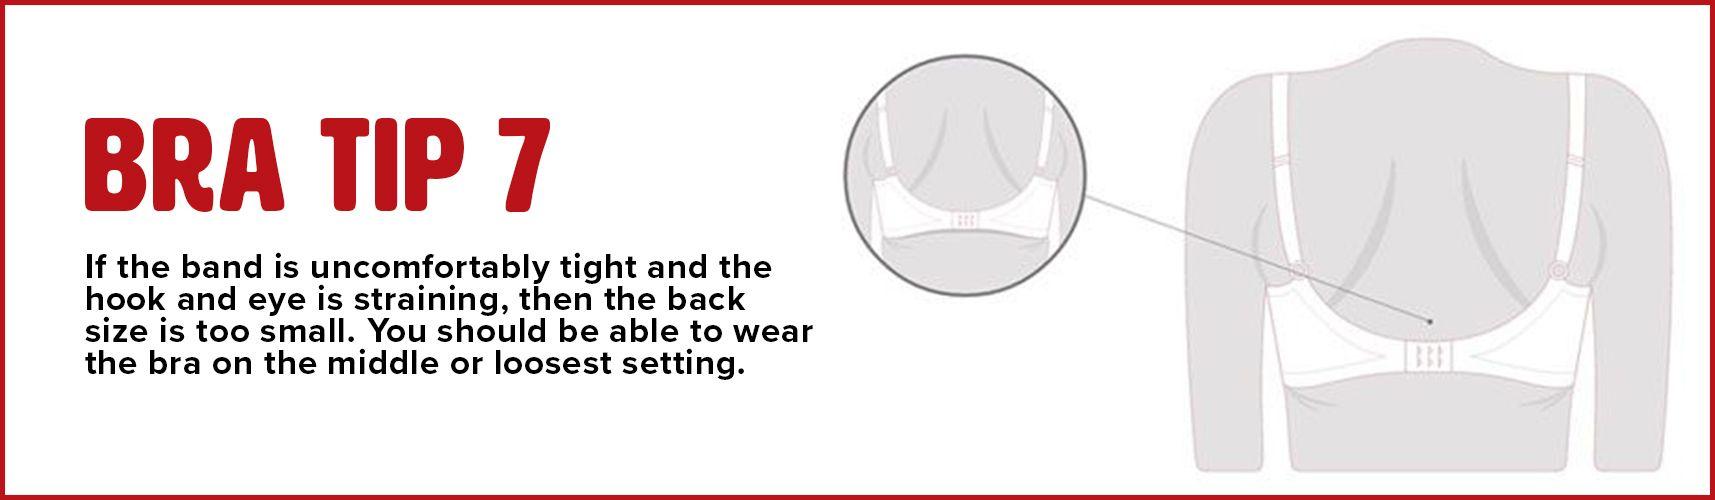 measure your bra size